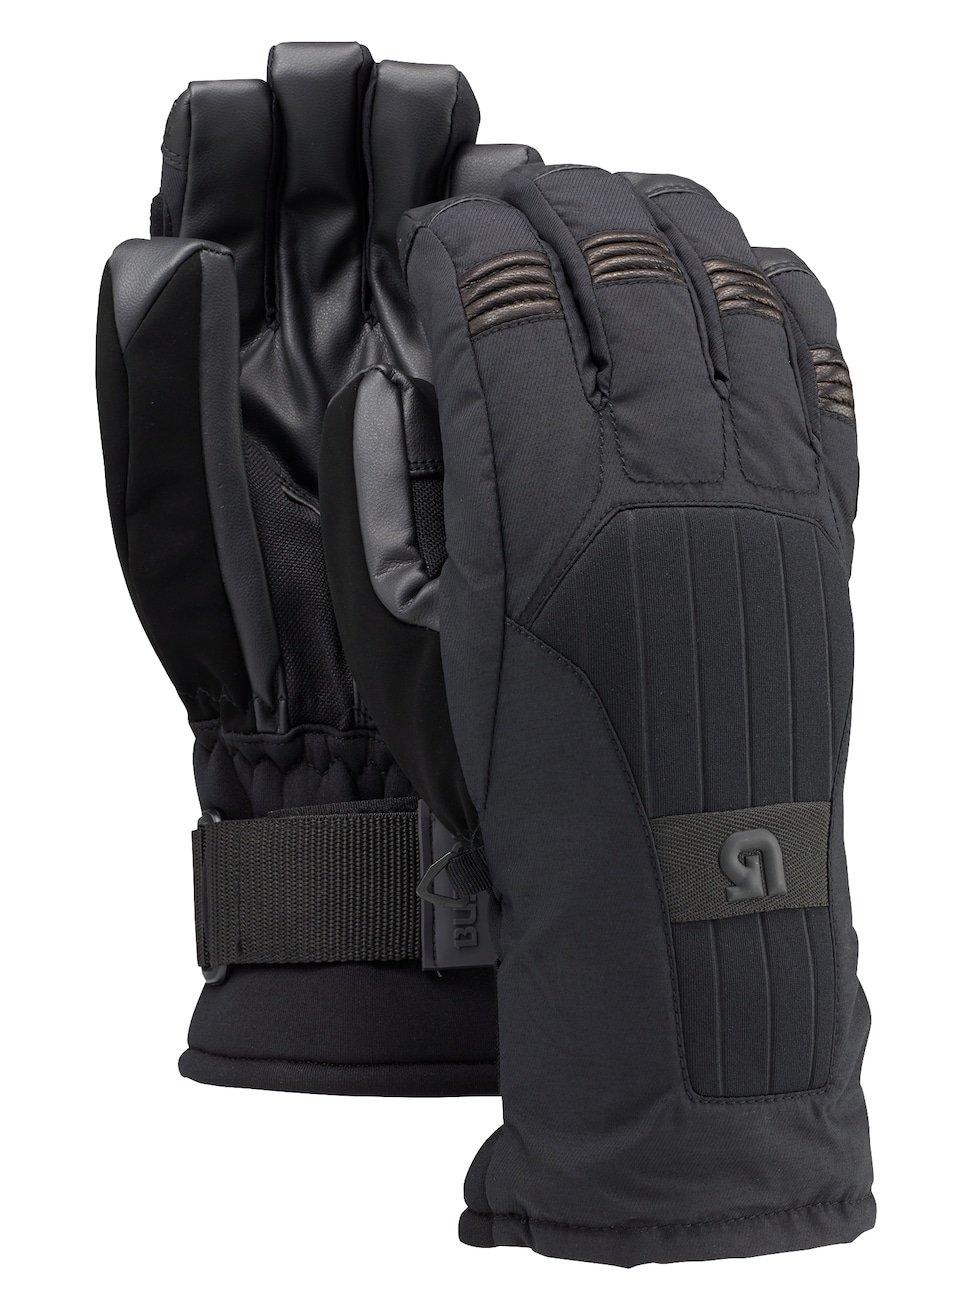 Burton Support Glove Snowboard Ski Gloves True Black Size Medium Removable Wristguard by Burton